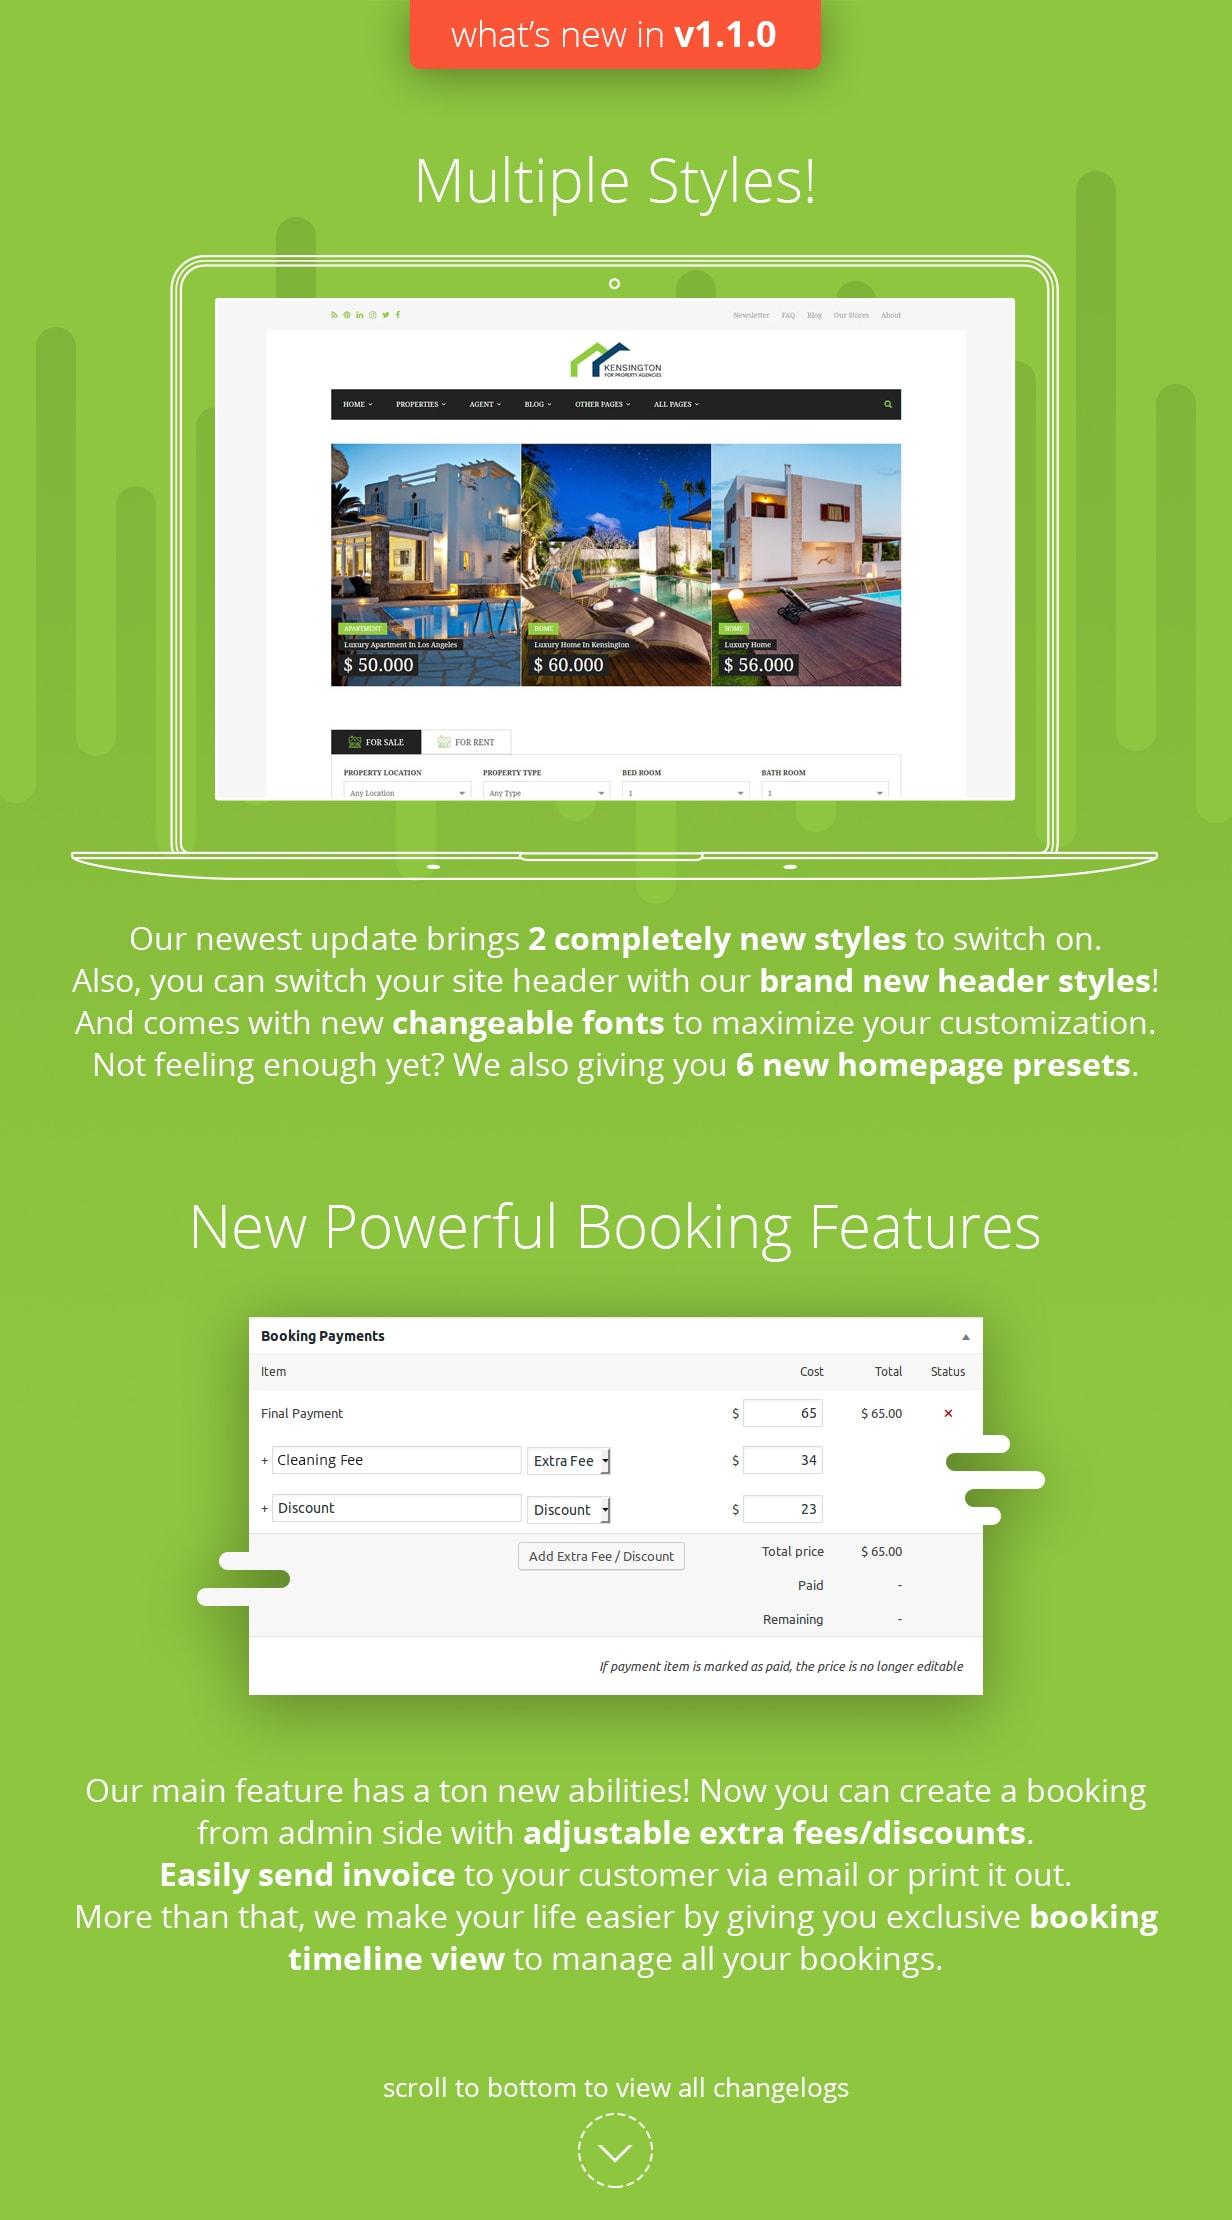 Kensington - Immobilien- und Immobilienmanagement WordPress Theme - 6